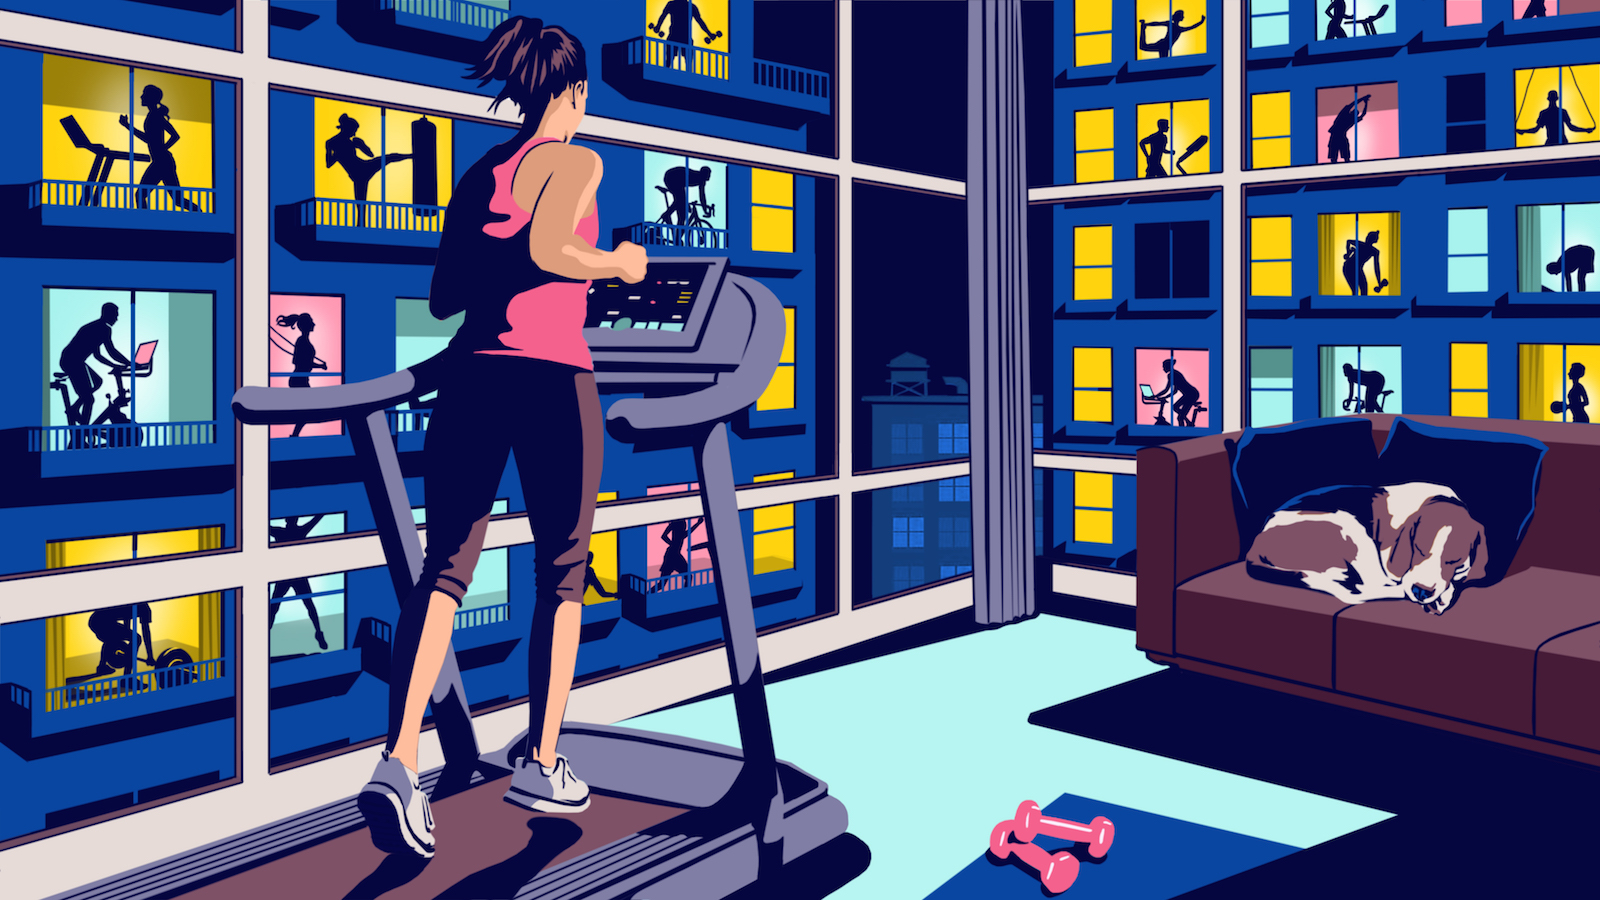 Bill Butcher / Virtual Exercise / Financial Times Life & Arts